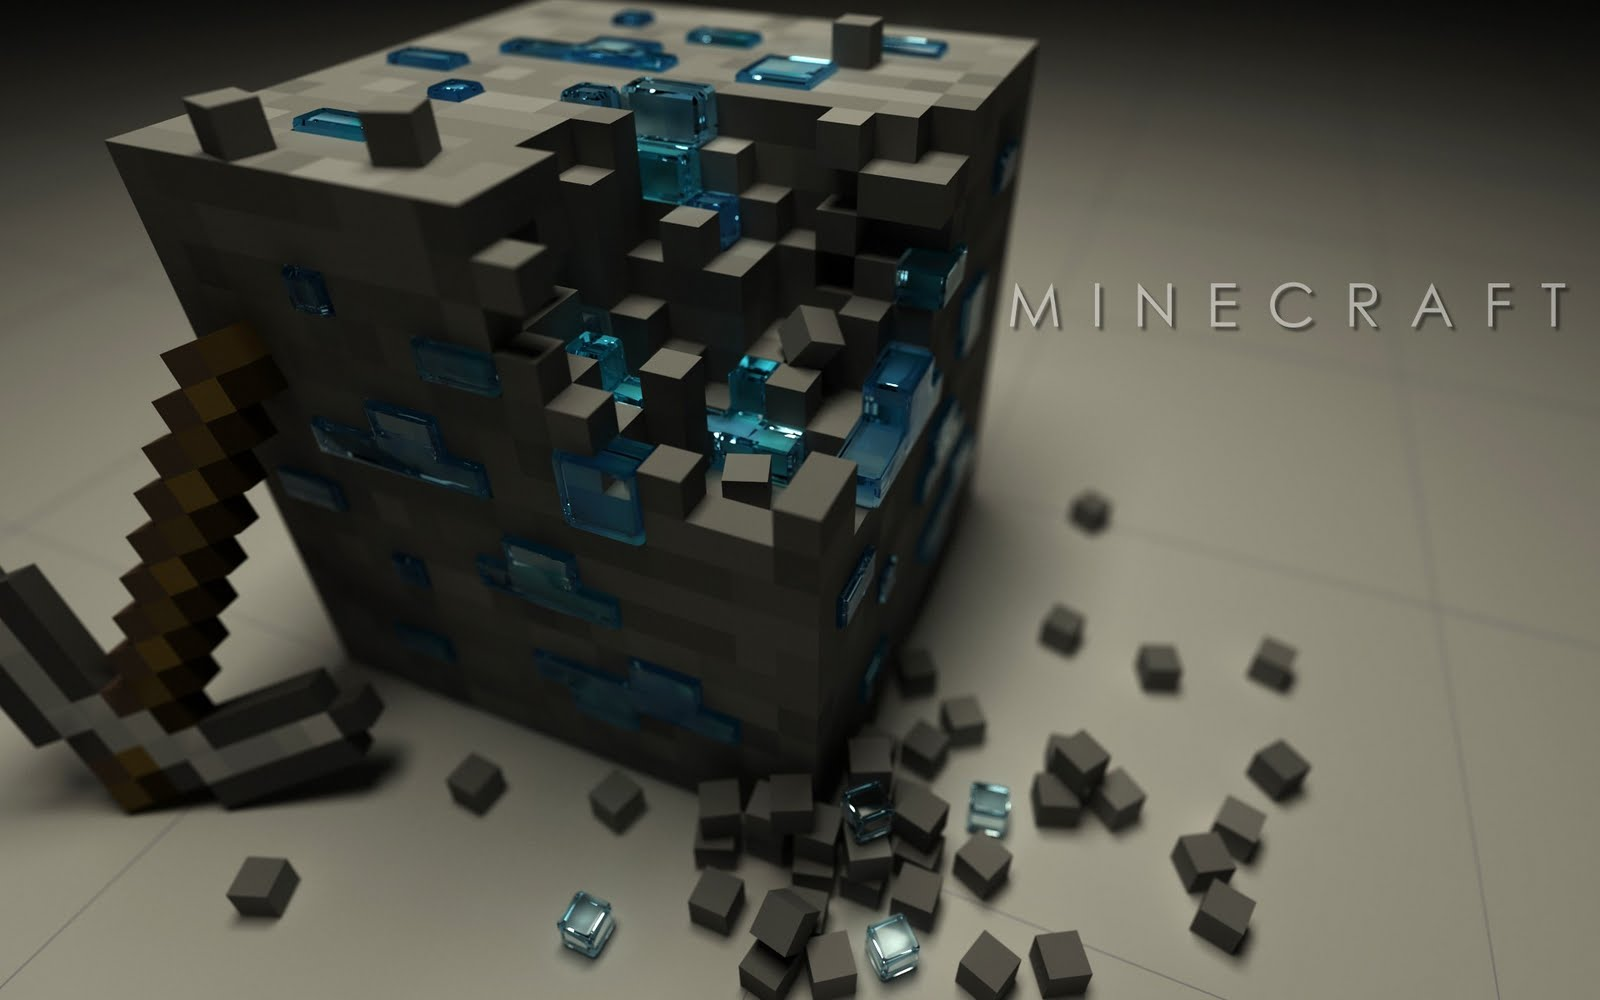 Minecraft - Мнение о Minecraft...